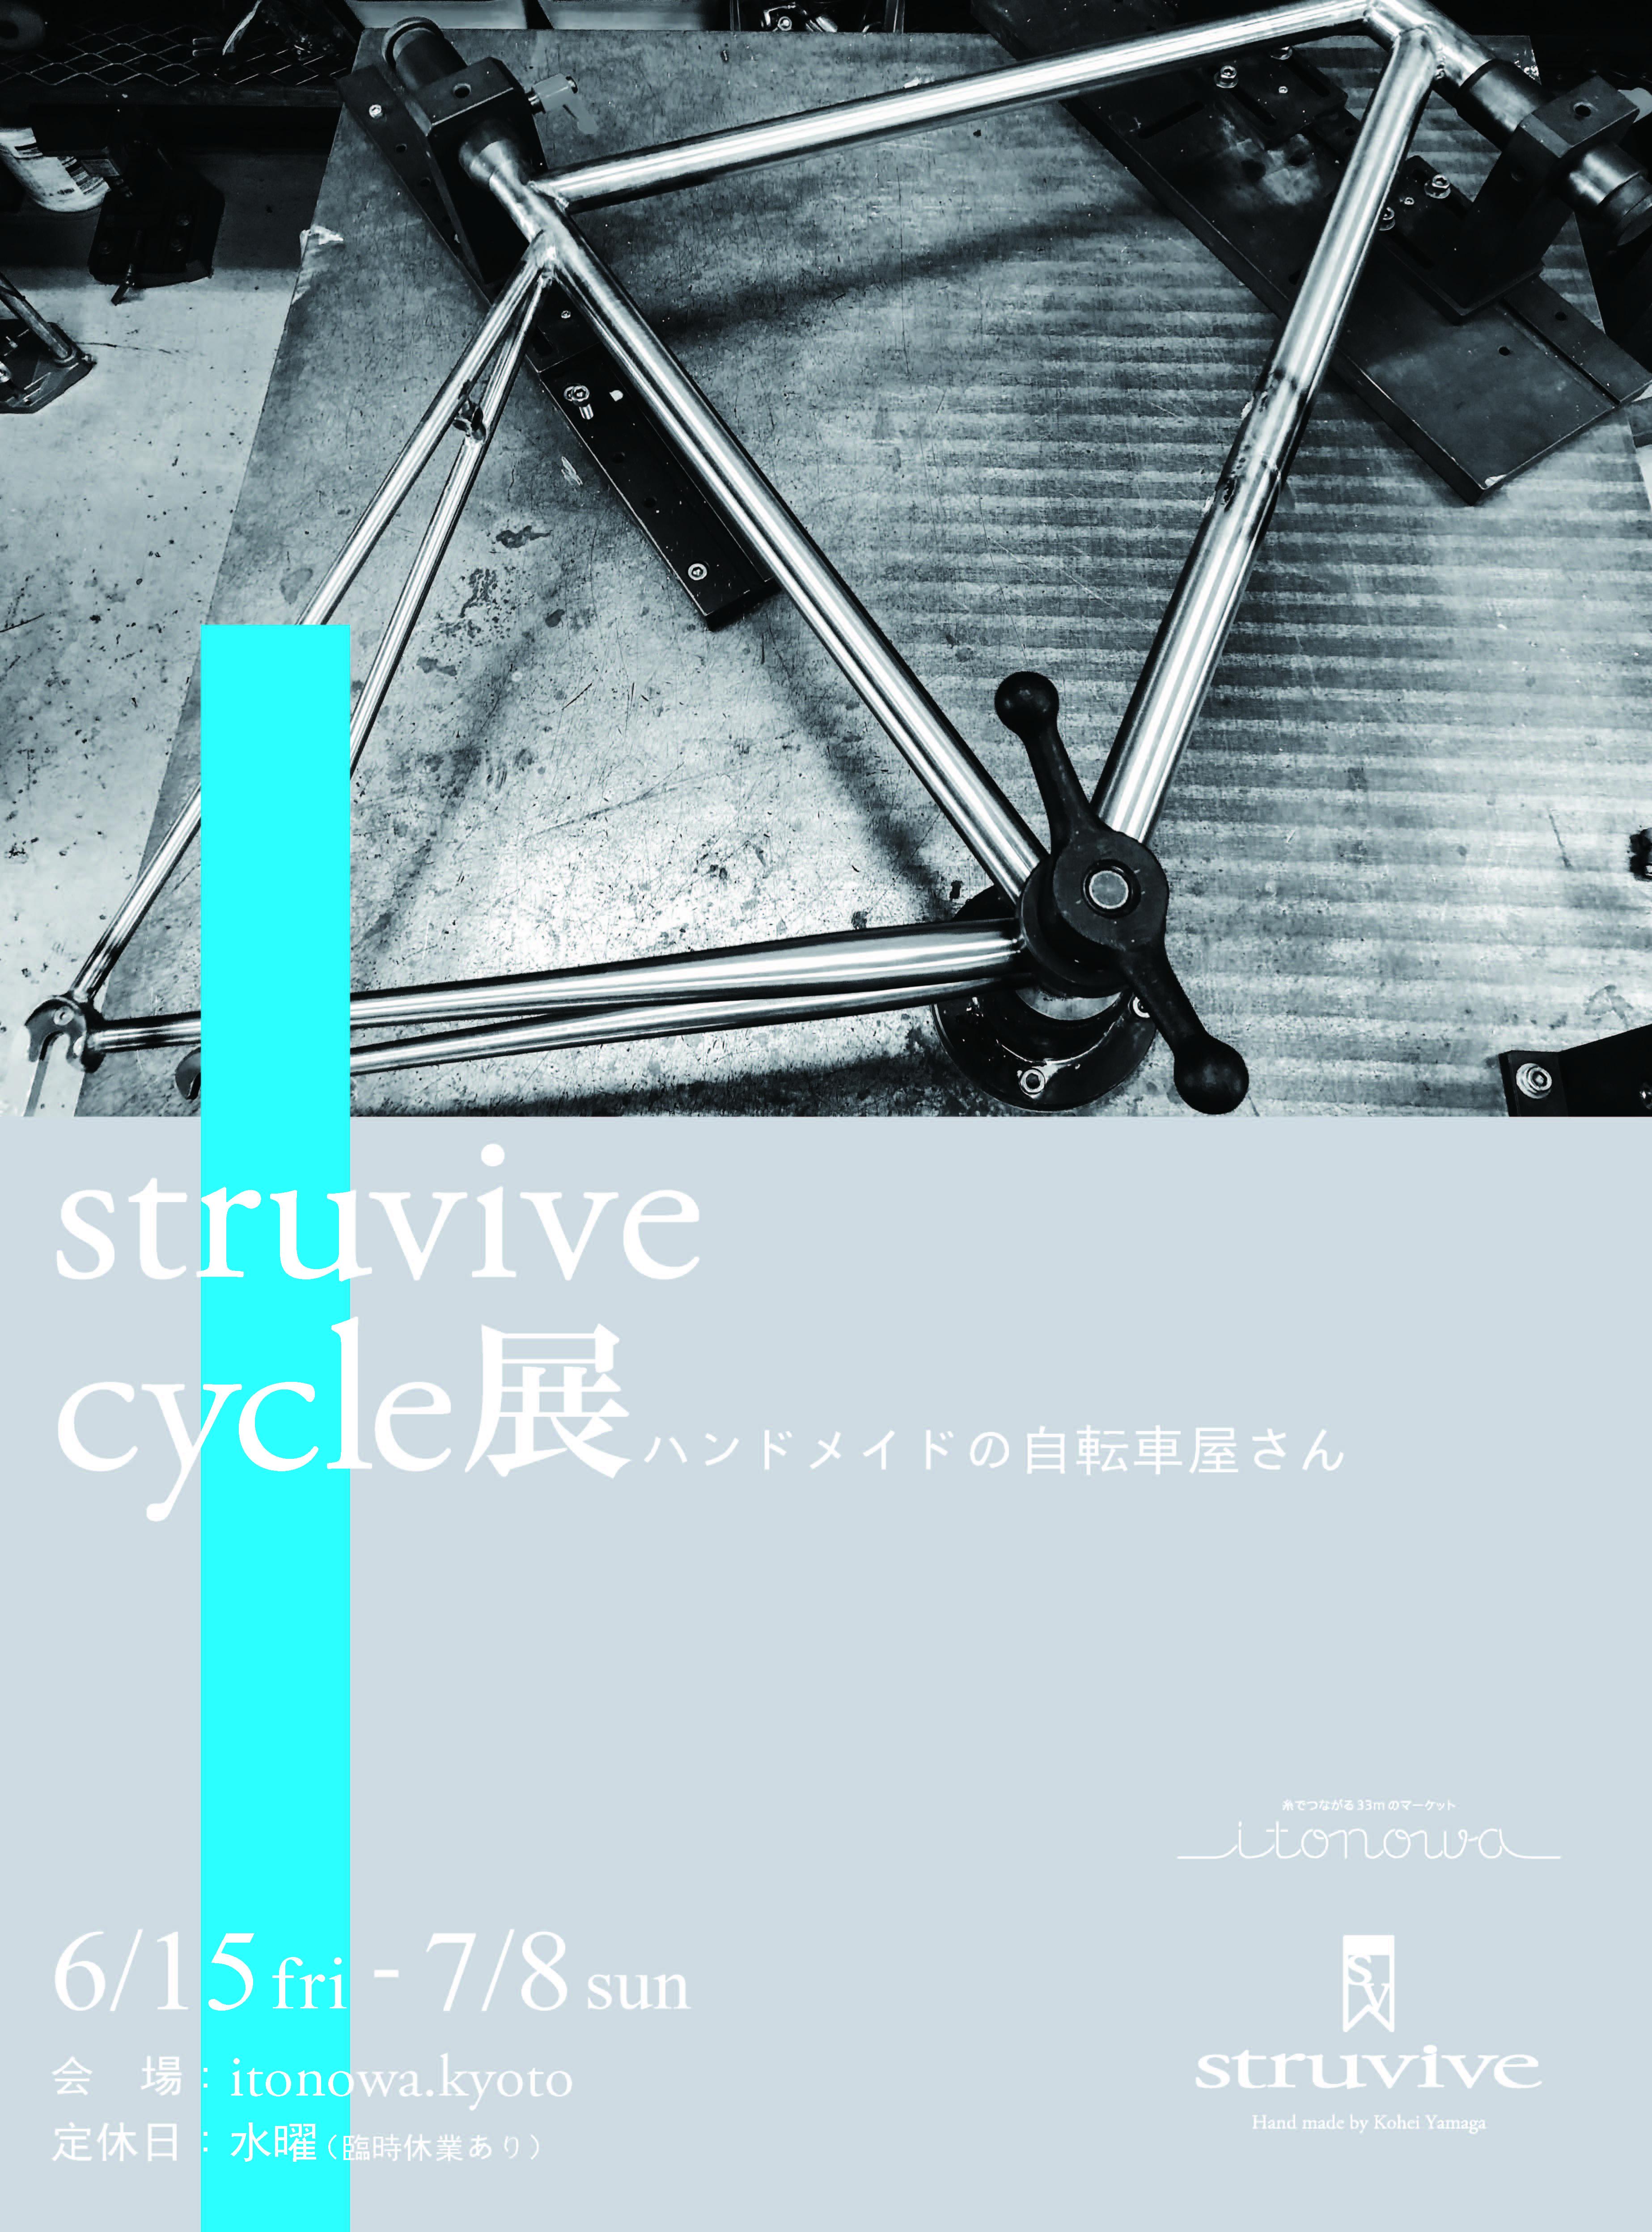 struvive cycle展 ハンドメイドの自転車屋さん